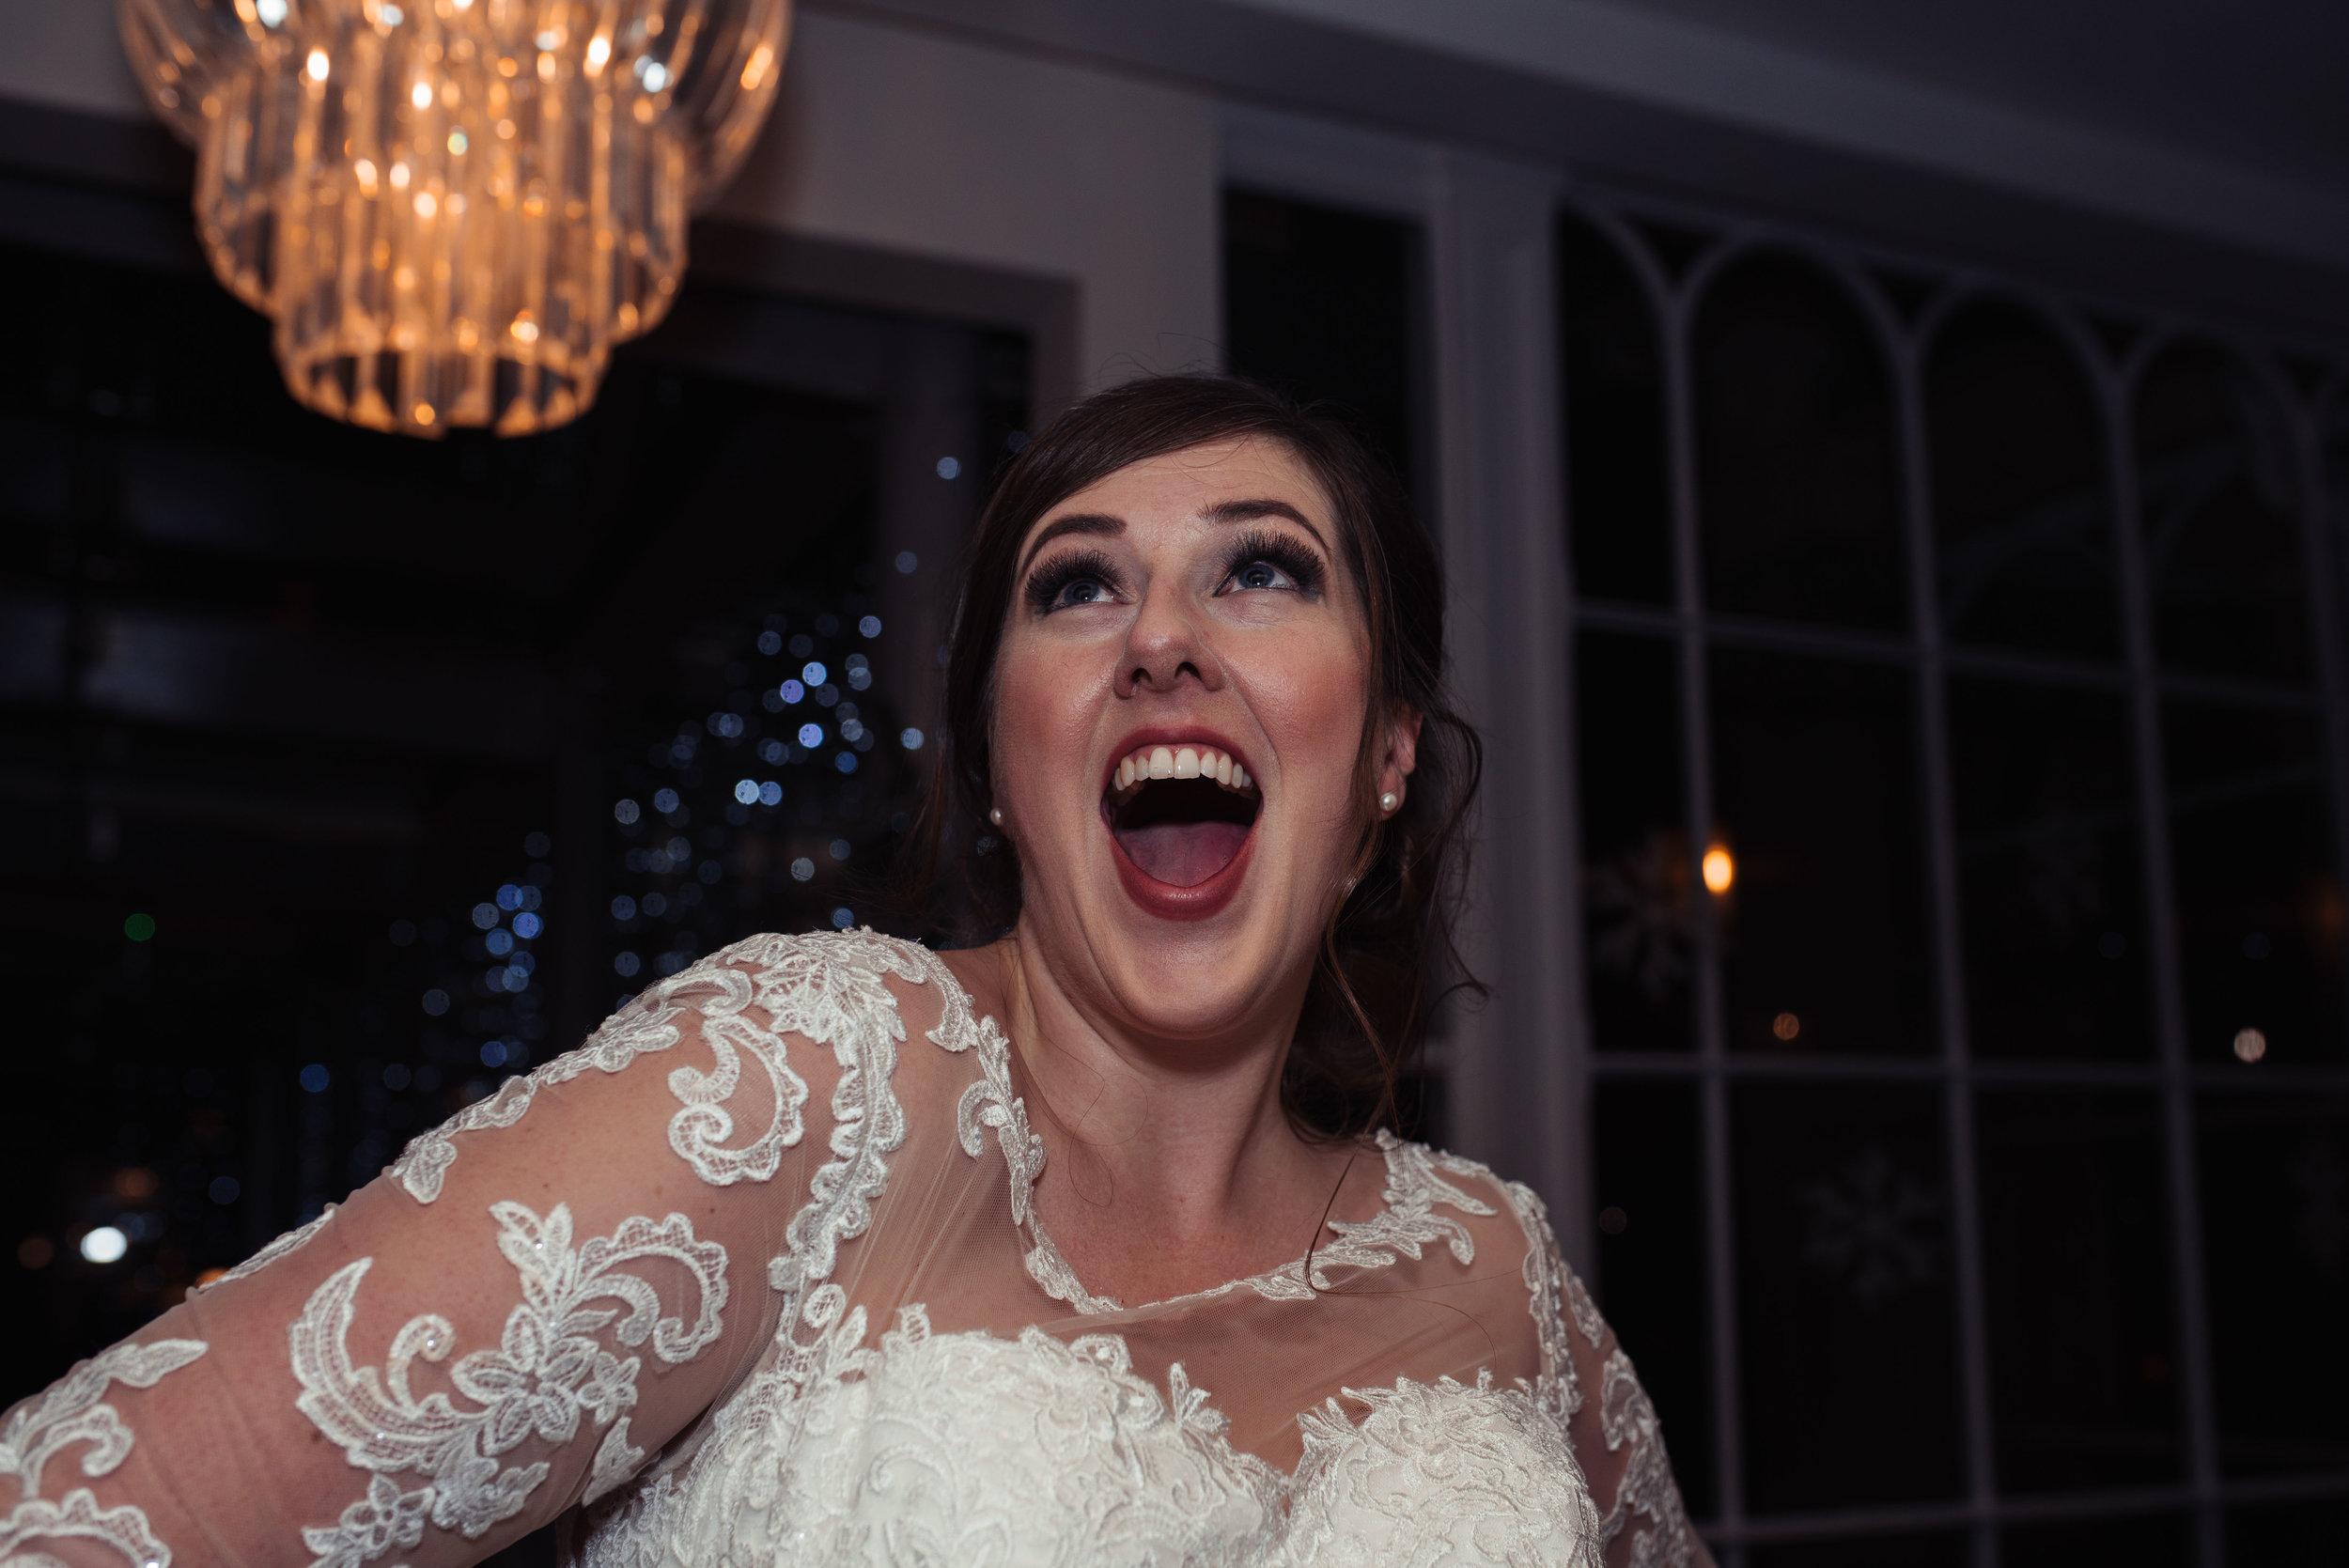 Belsfield-wedding-photography-50.jpg